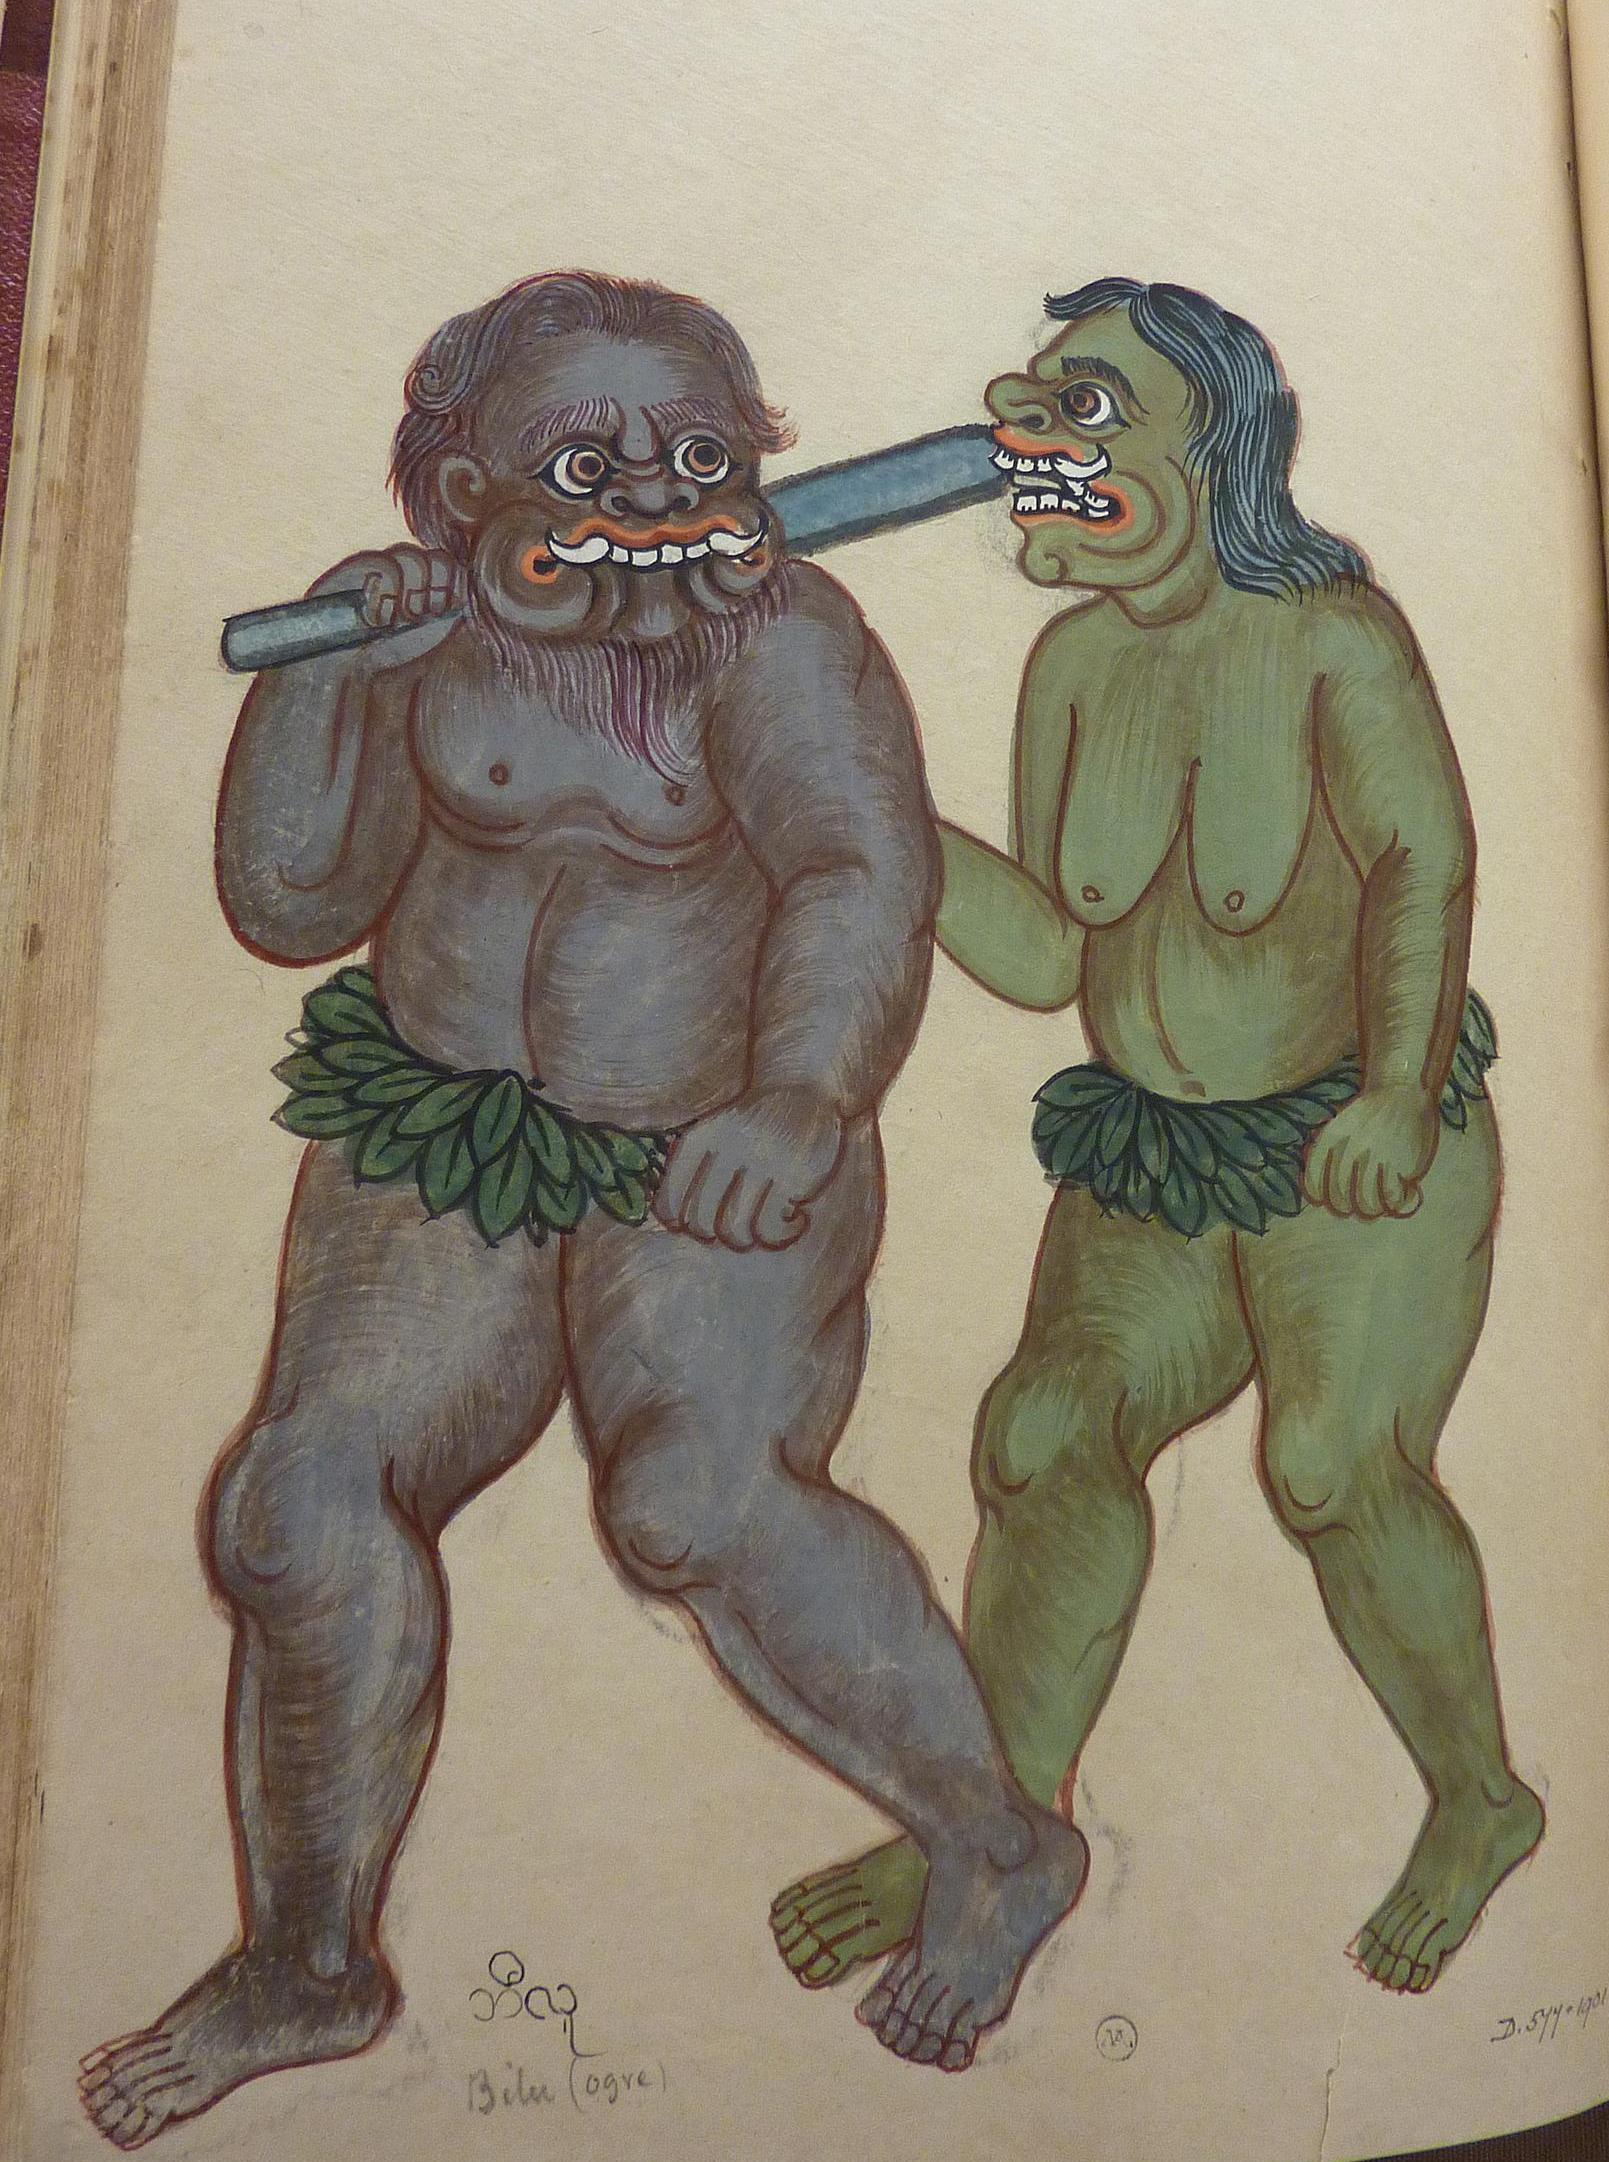 D.577-1901 Savage people - cannibals supposed to inhabit Andamans - Bilu (ogre)